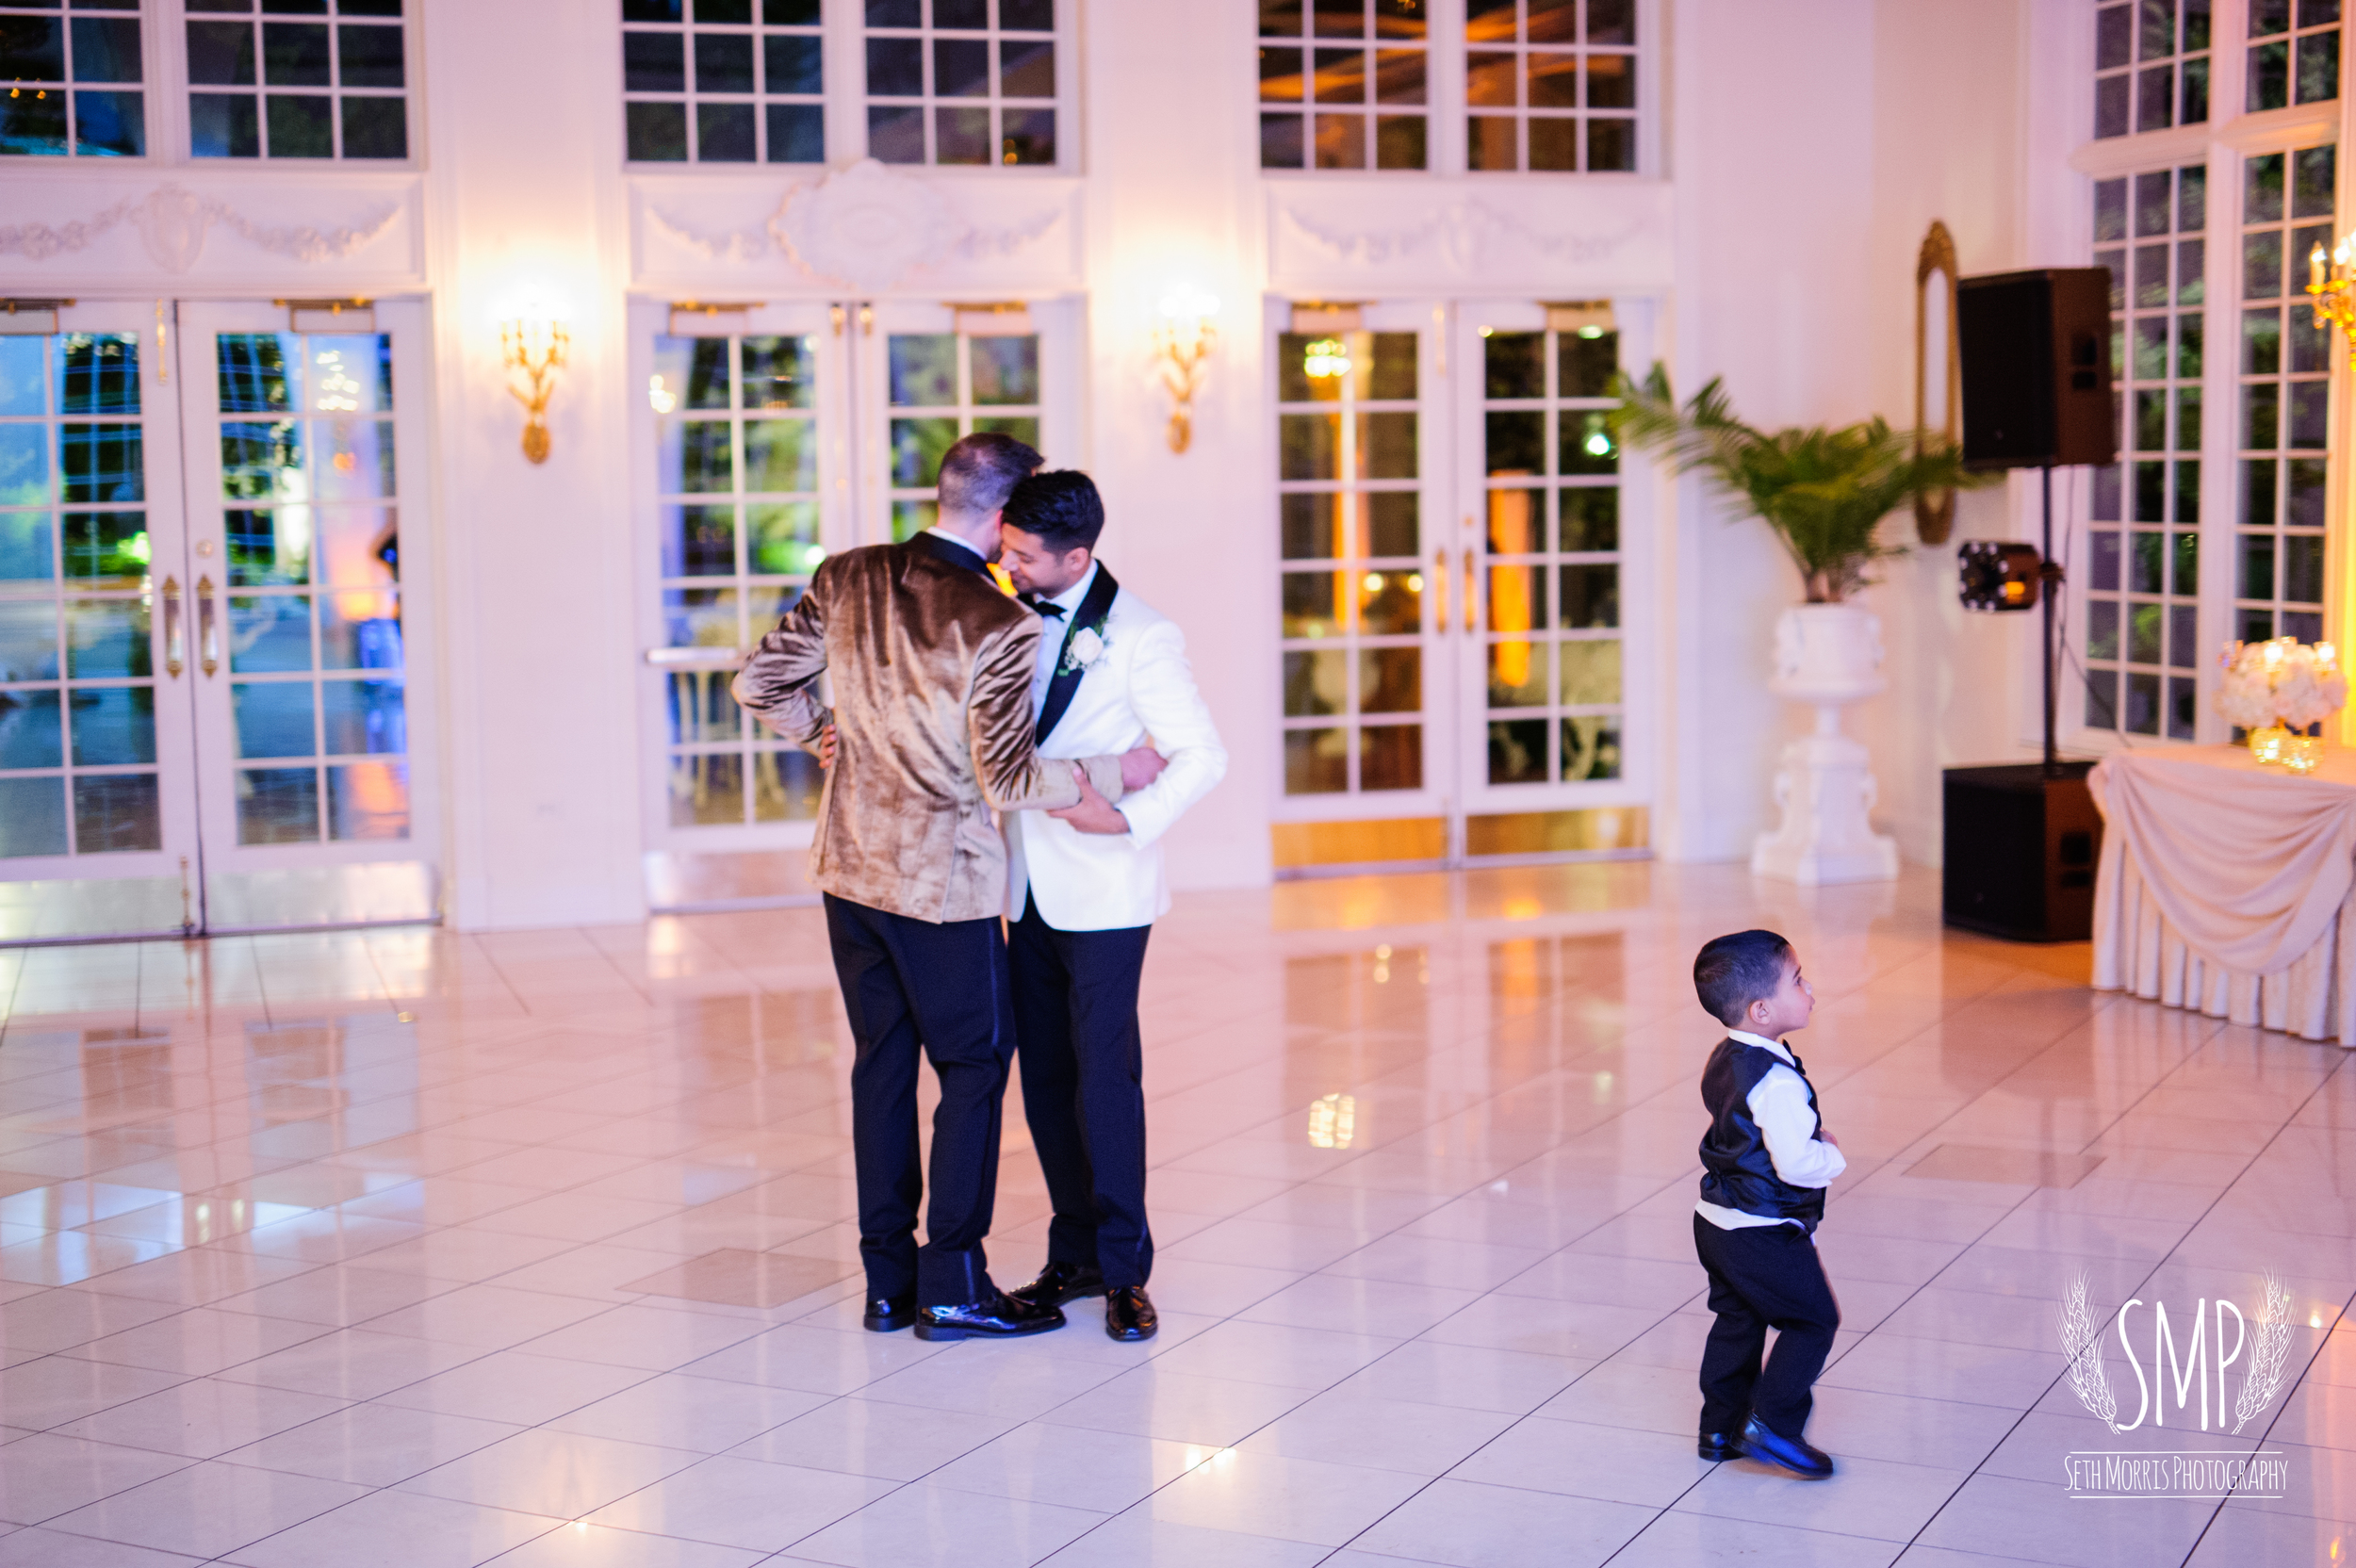 same-sex-wedding-photographer-chicago-illinois-107.jpg